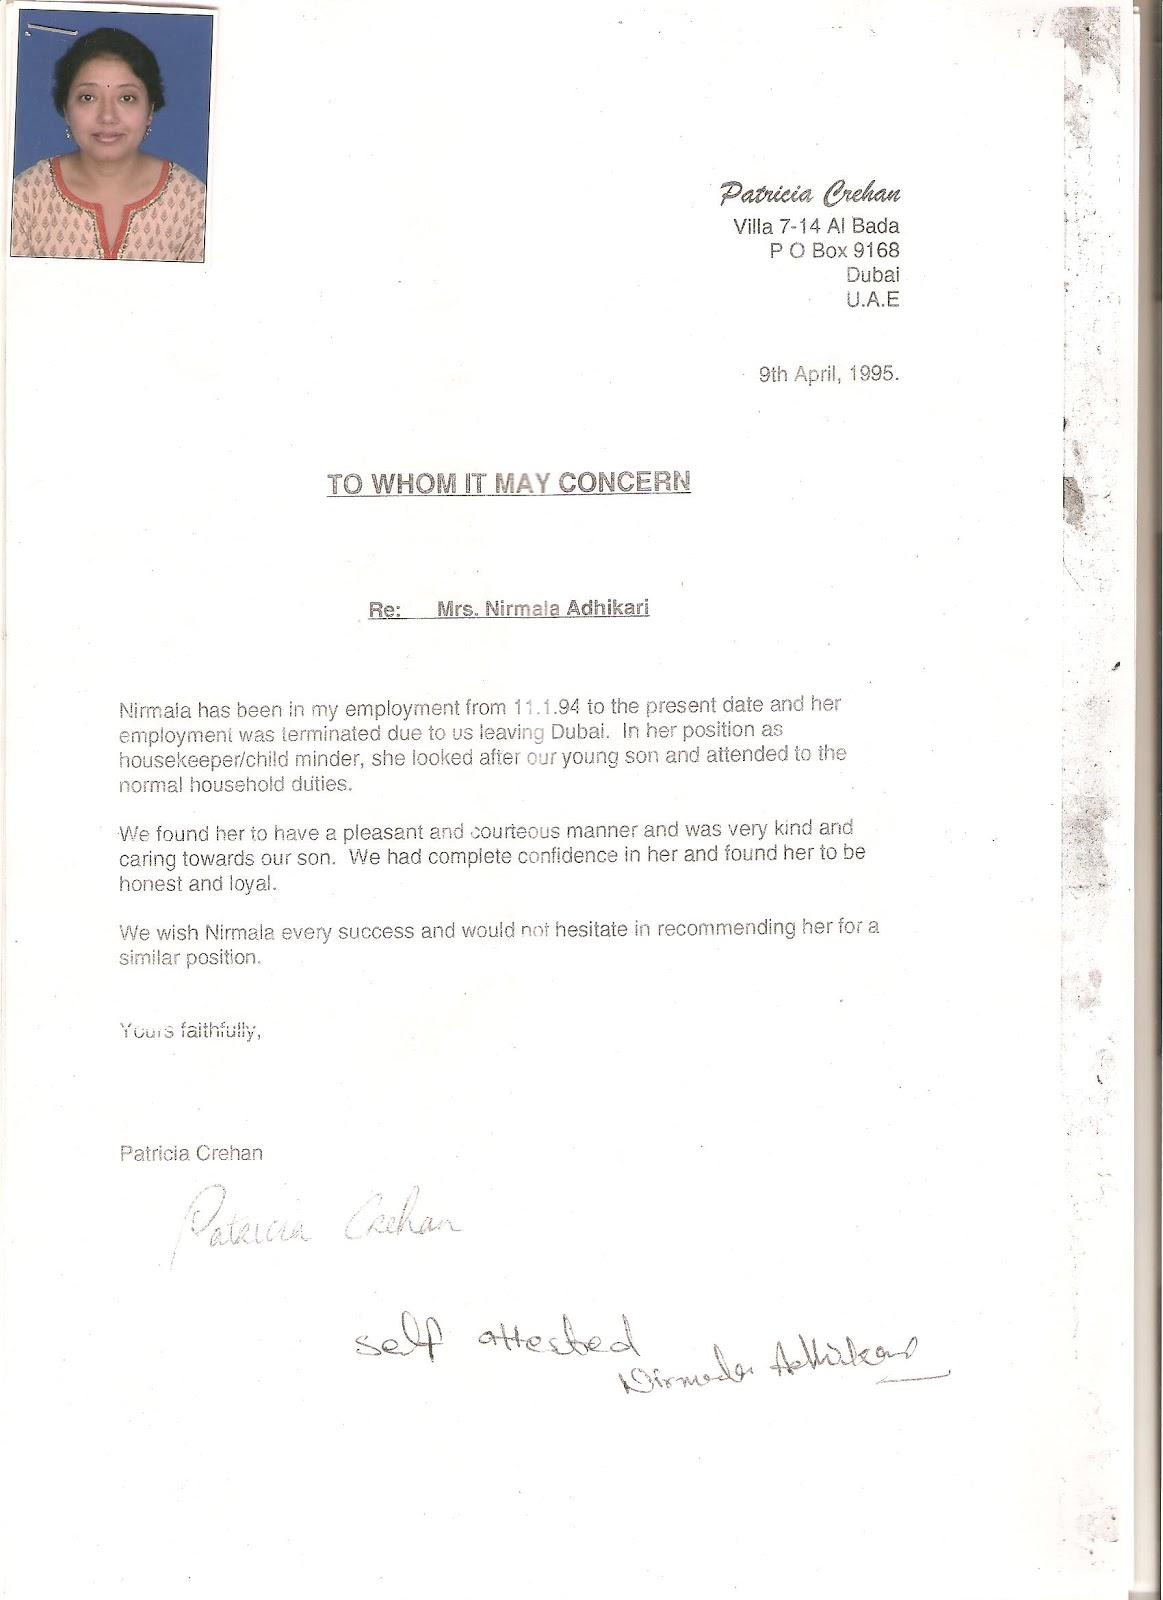 2011 nanny job seekers resume 40hotmail com